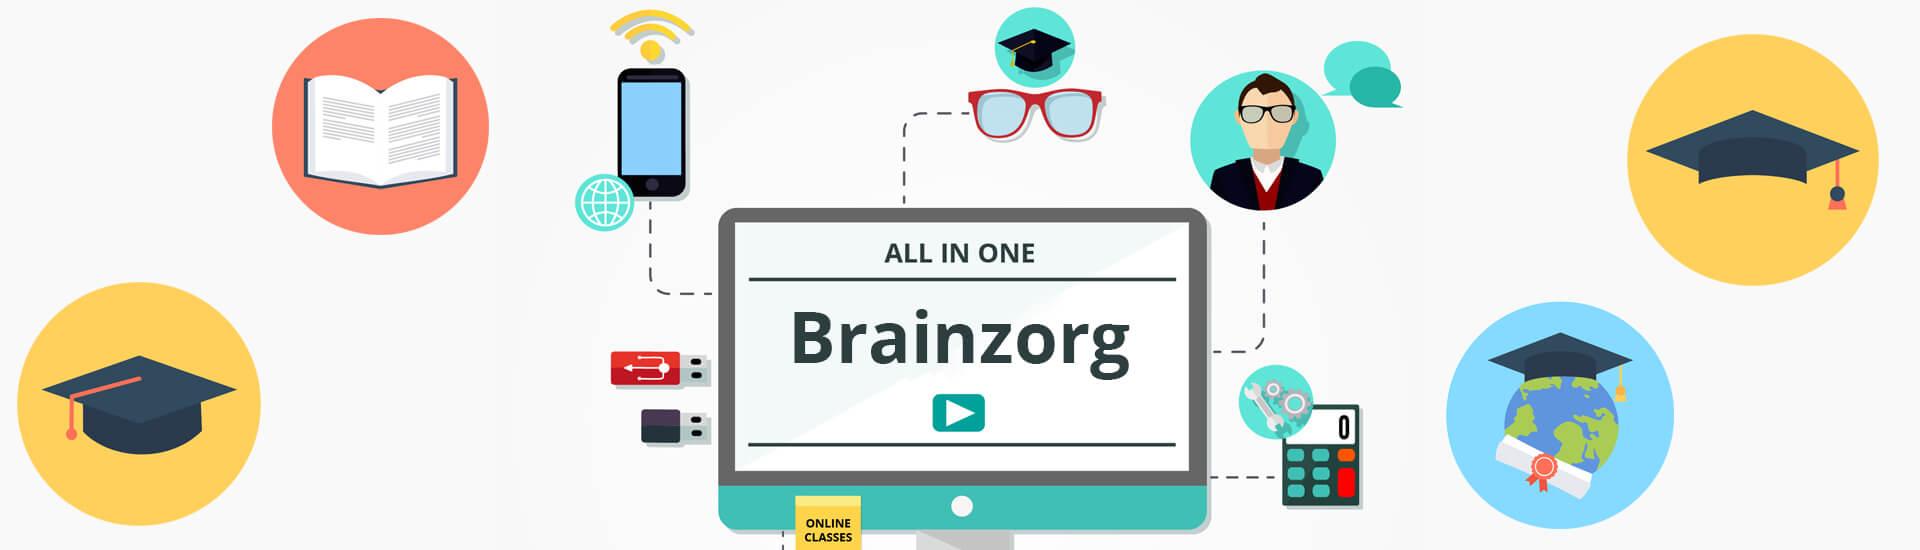 online course - brainzorg